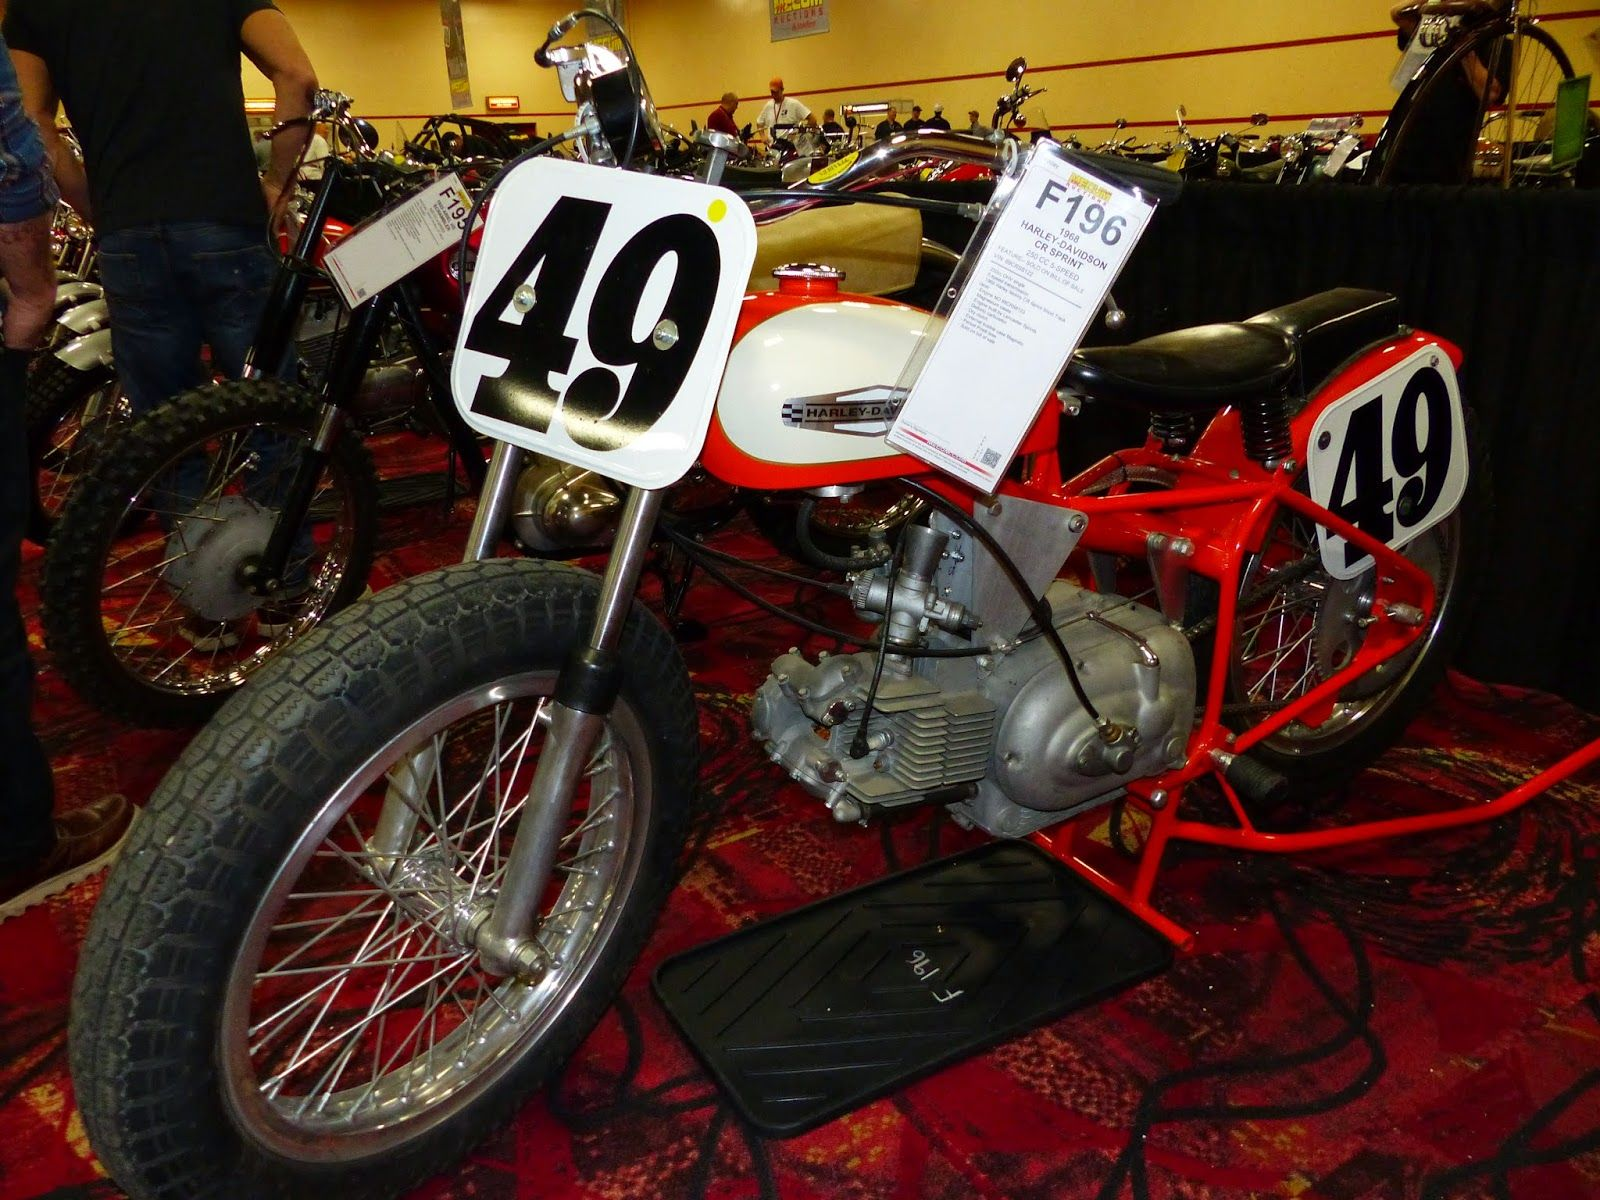 OldMotoDude 1968 Harley Davidson Aermacchi CR250 for sale at t